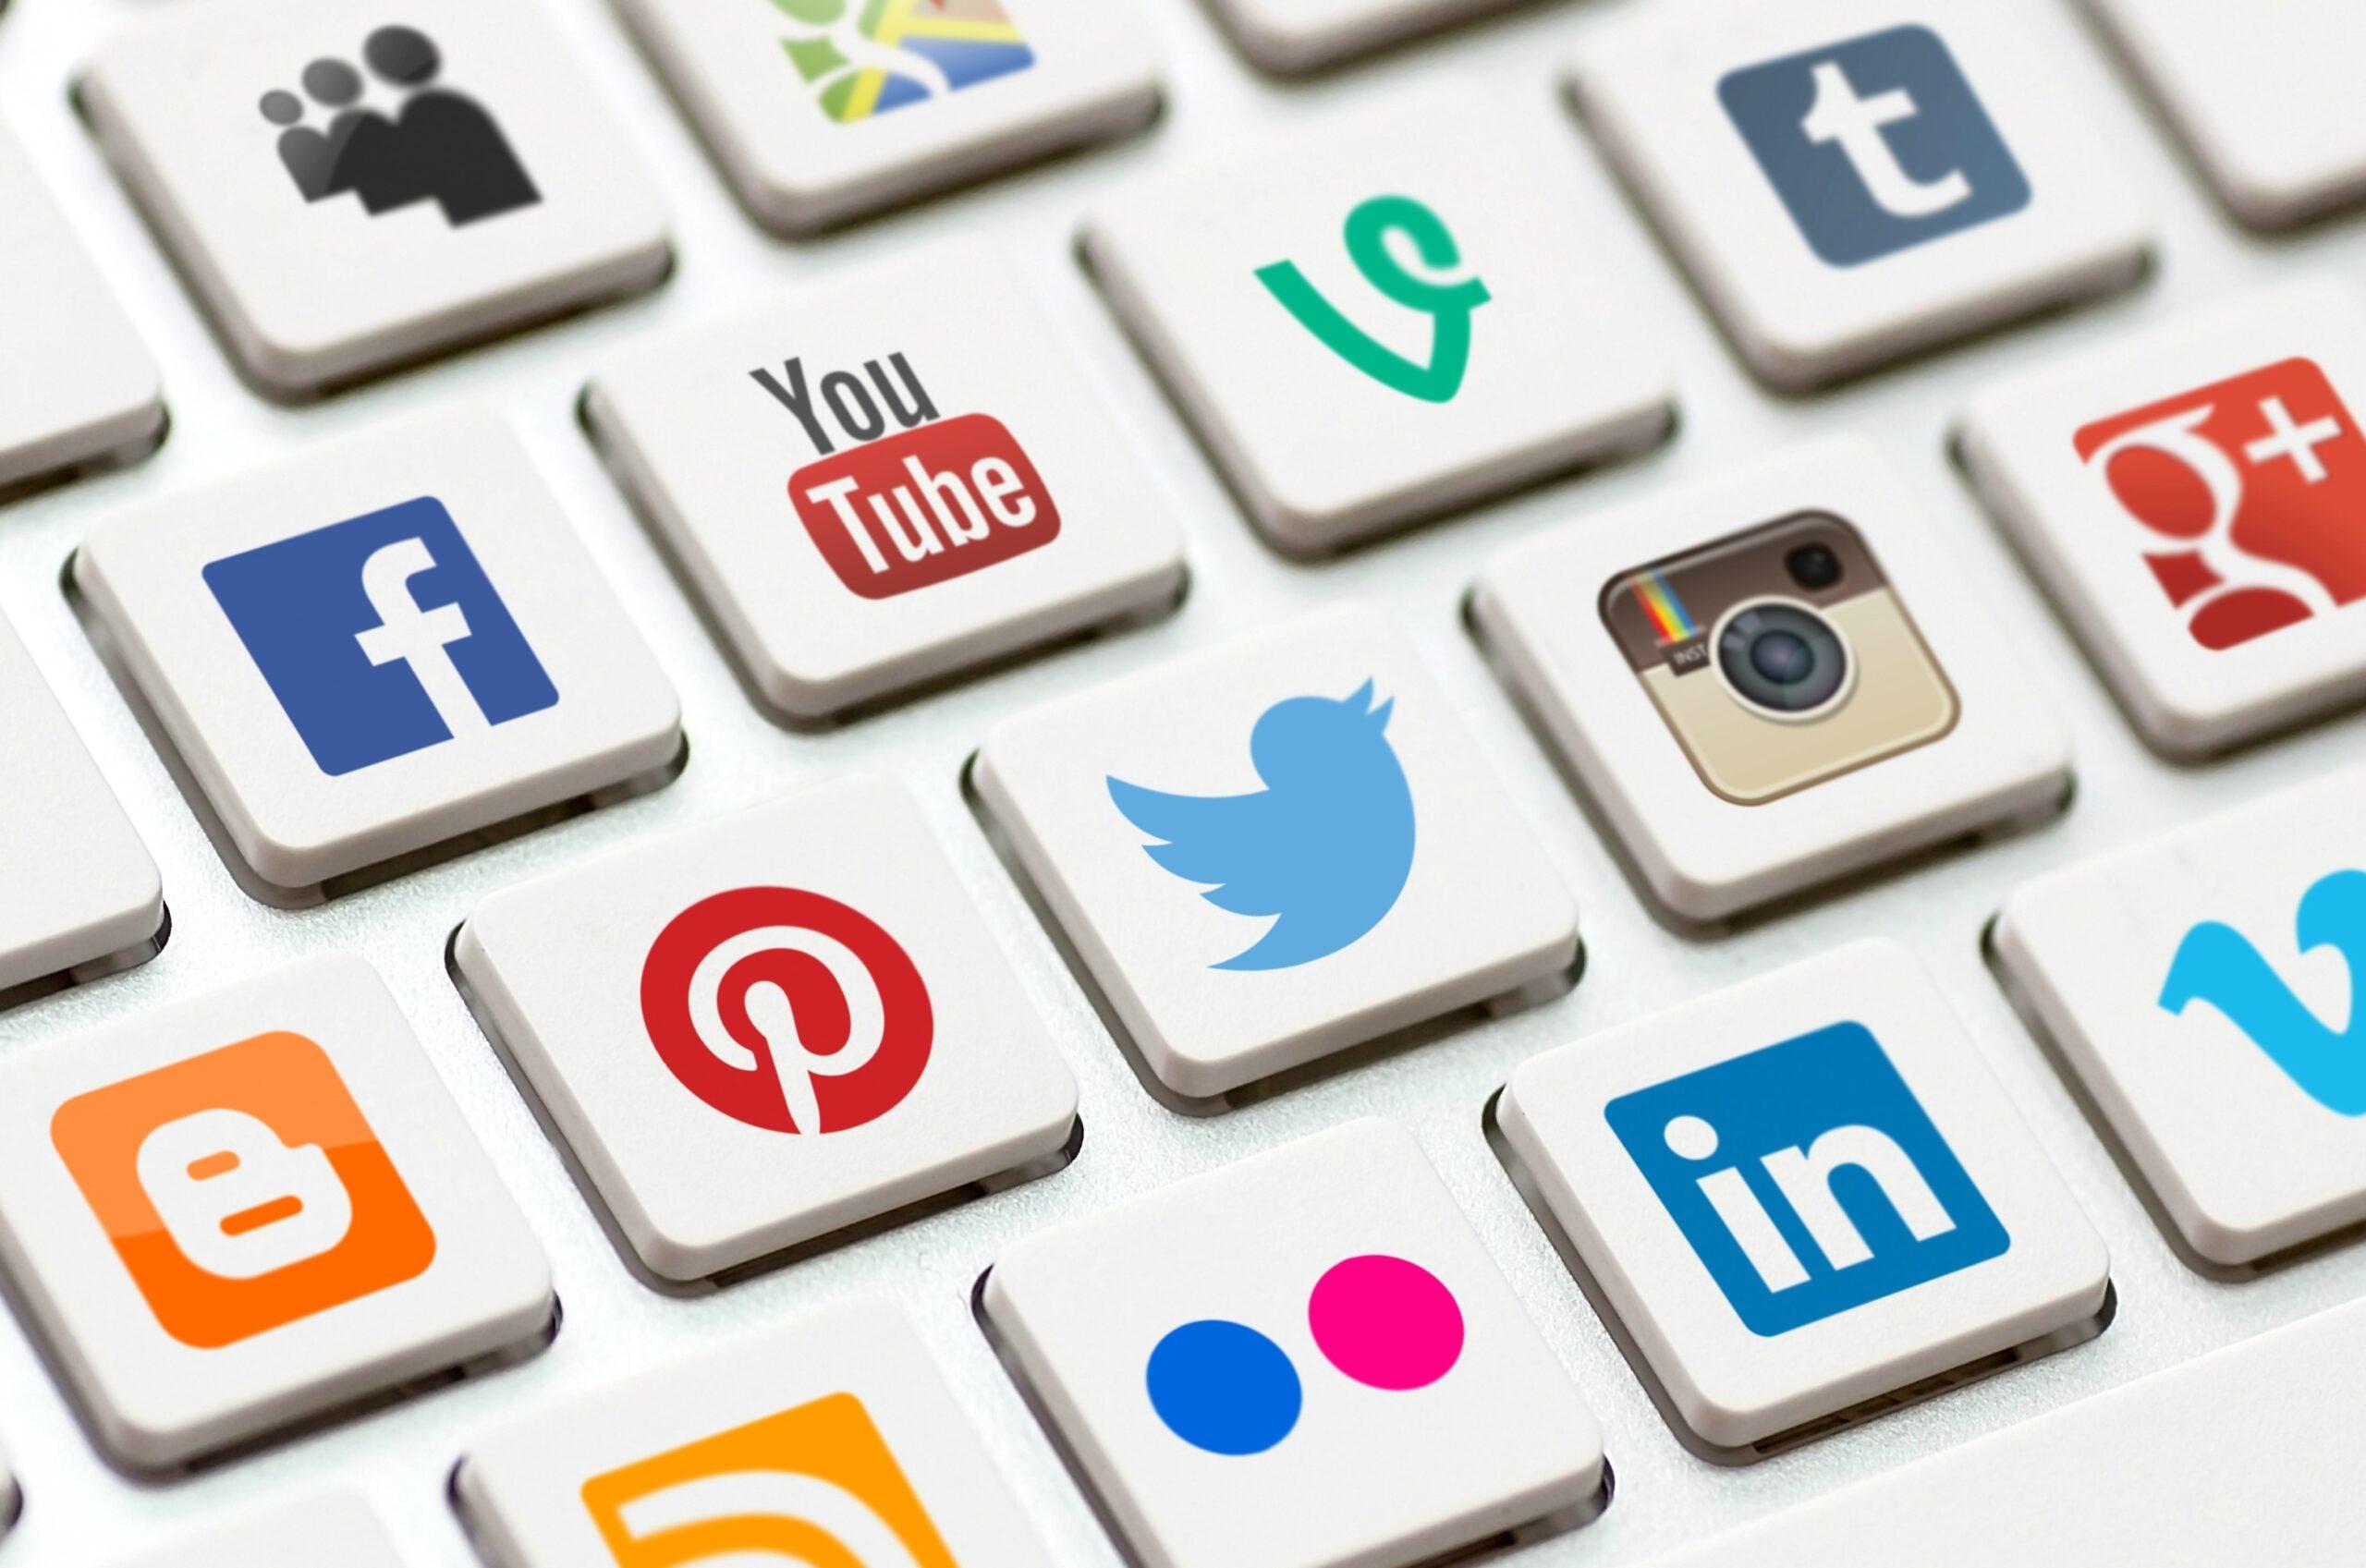 Адвокатське бюро в соціальних мережах